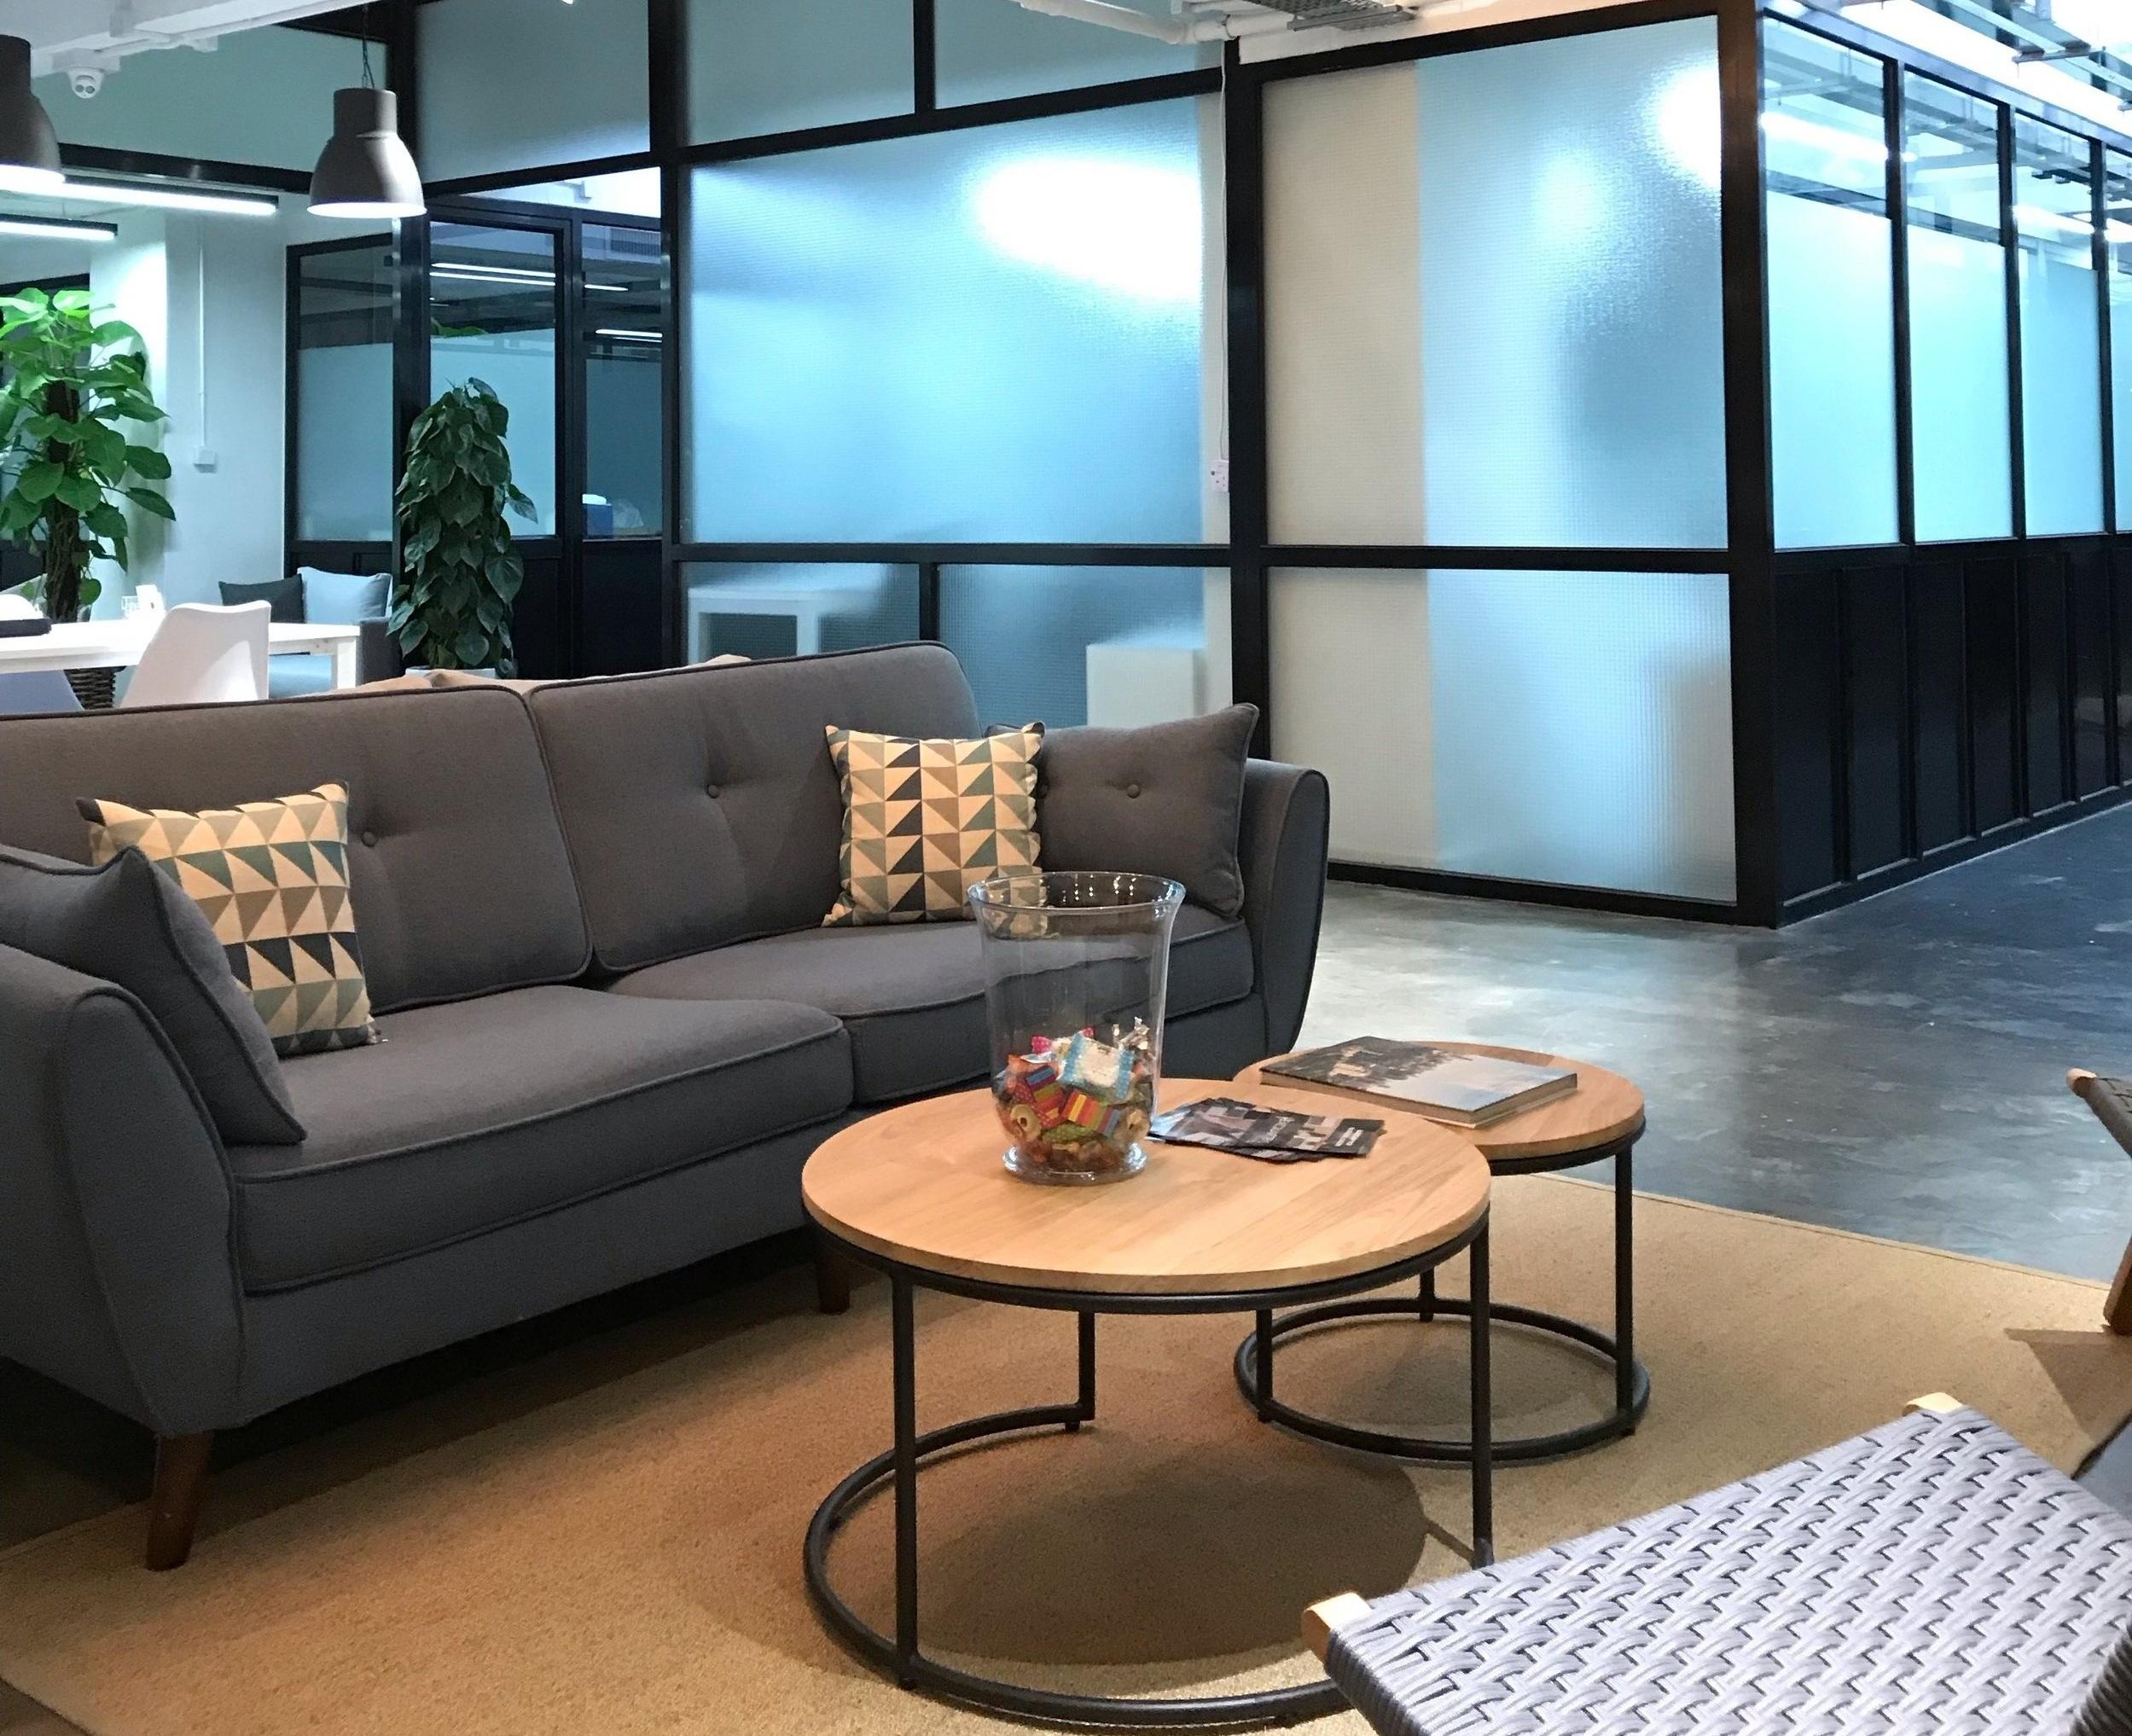 Comfortable Environment -